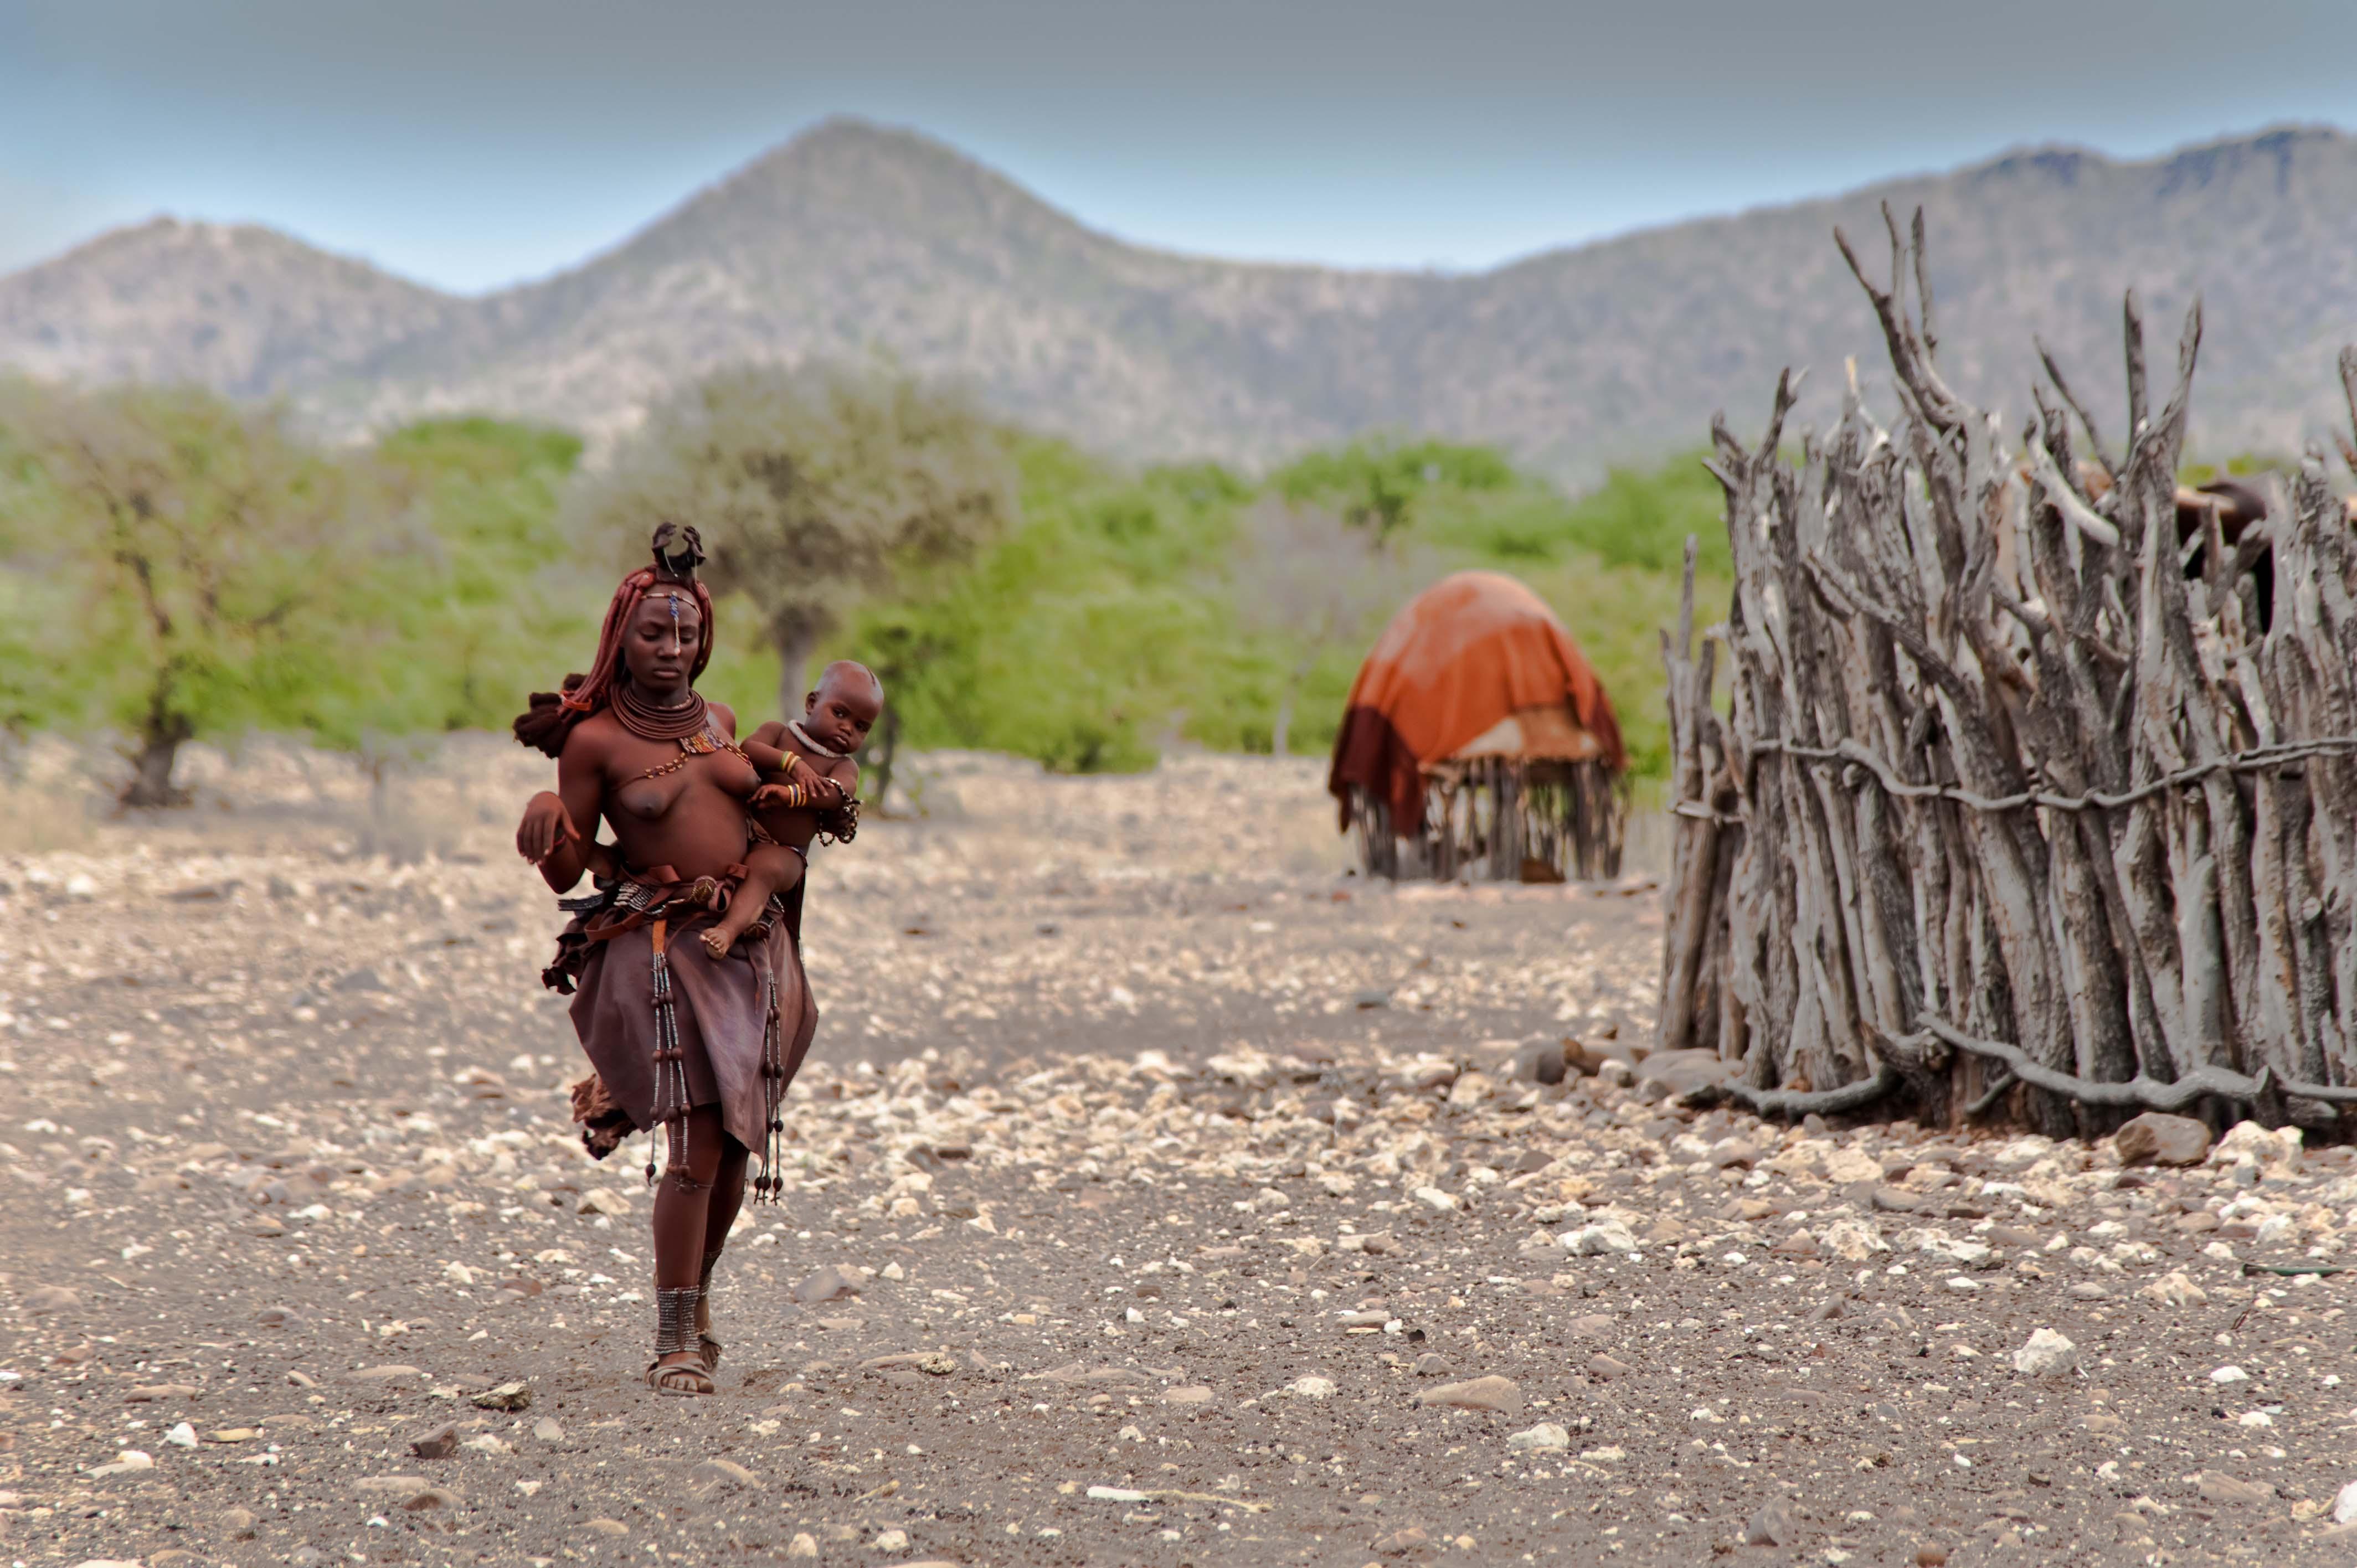 People Of Namibia Bengt Bjurstrm Photography